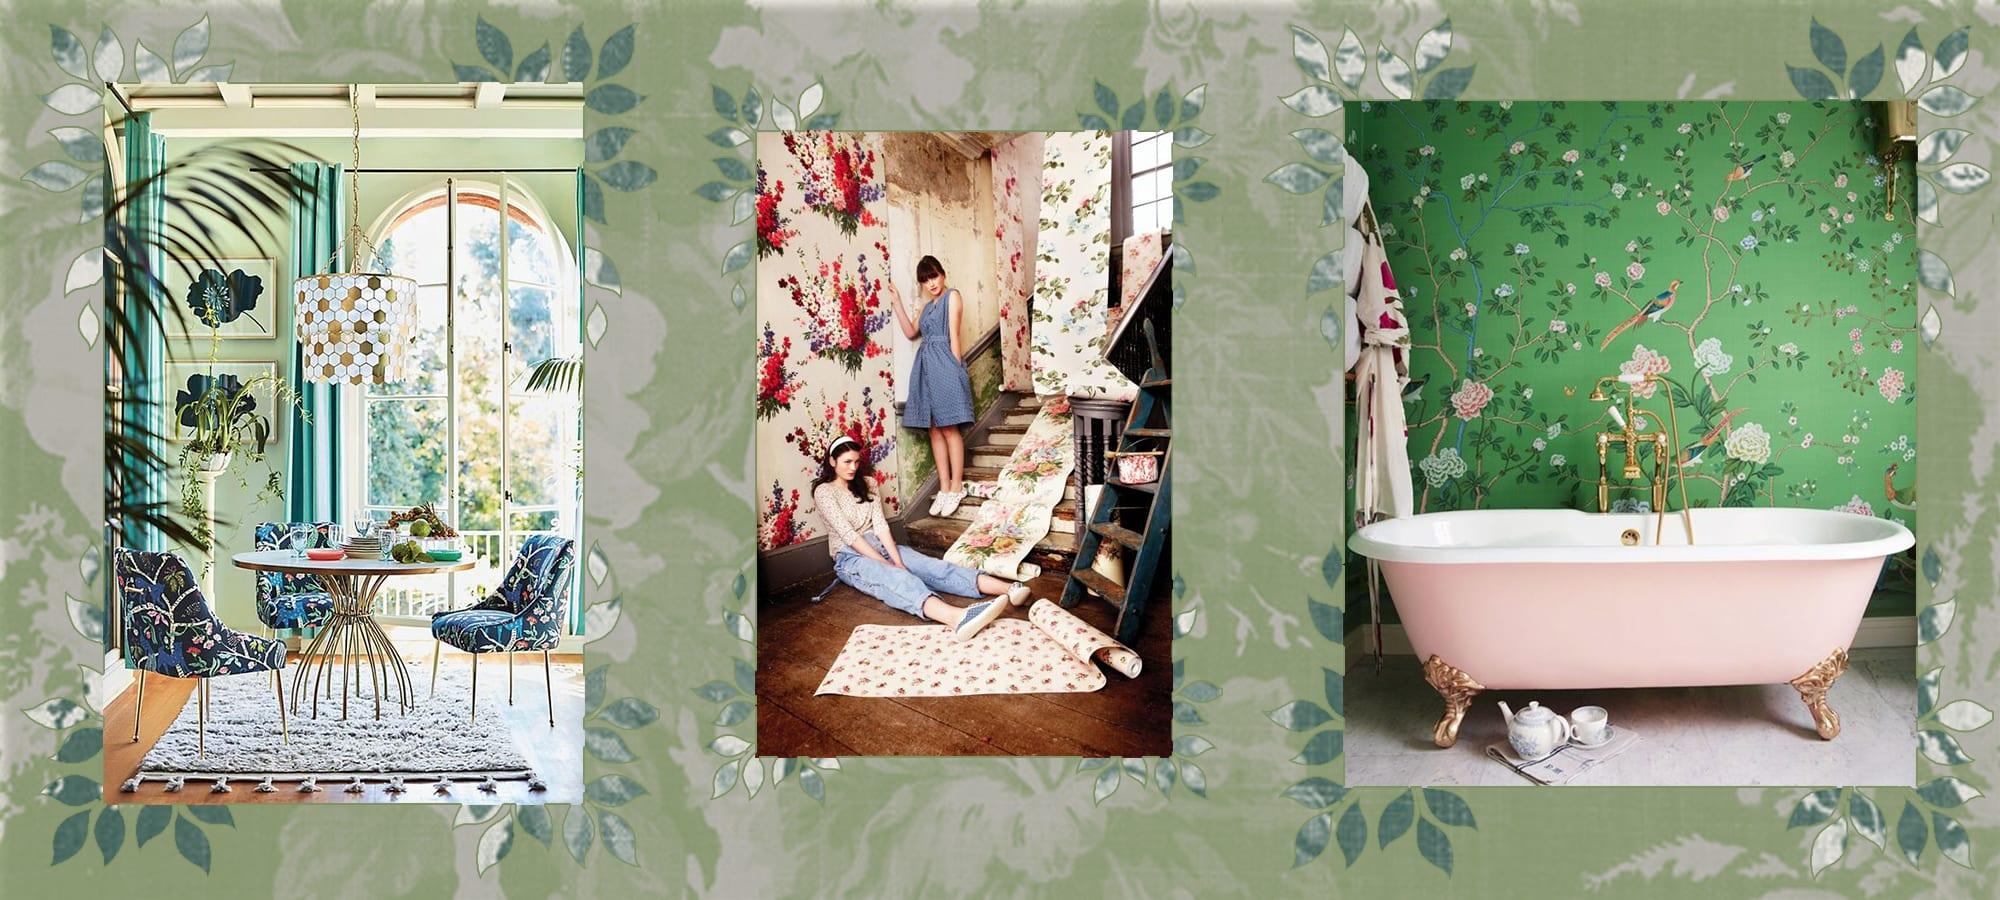 Floral Patterns in Interior Design